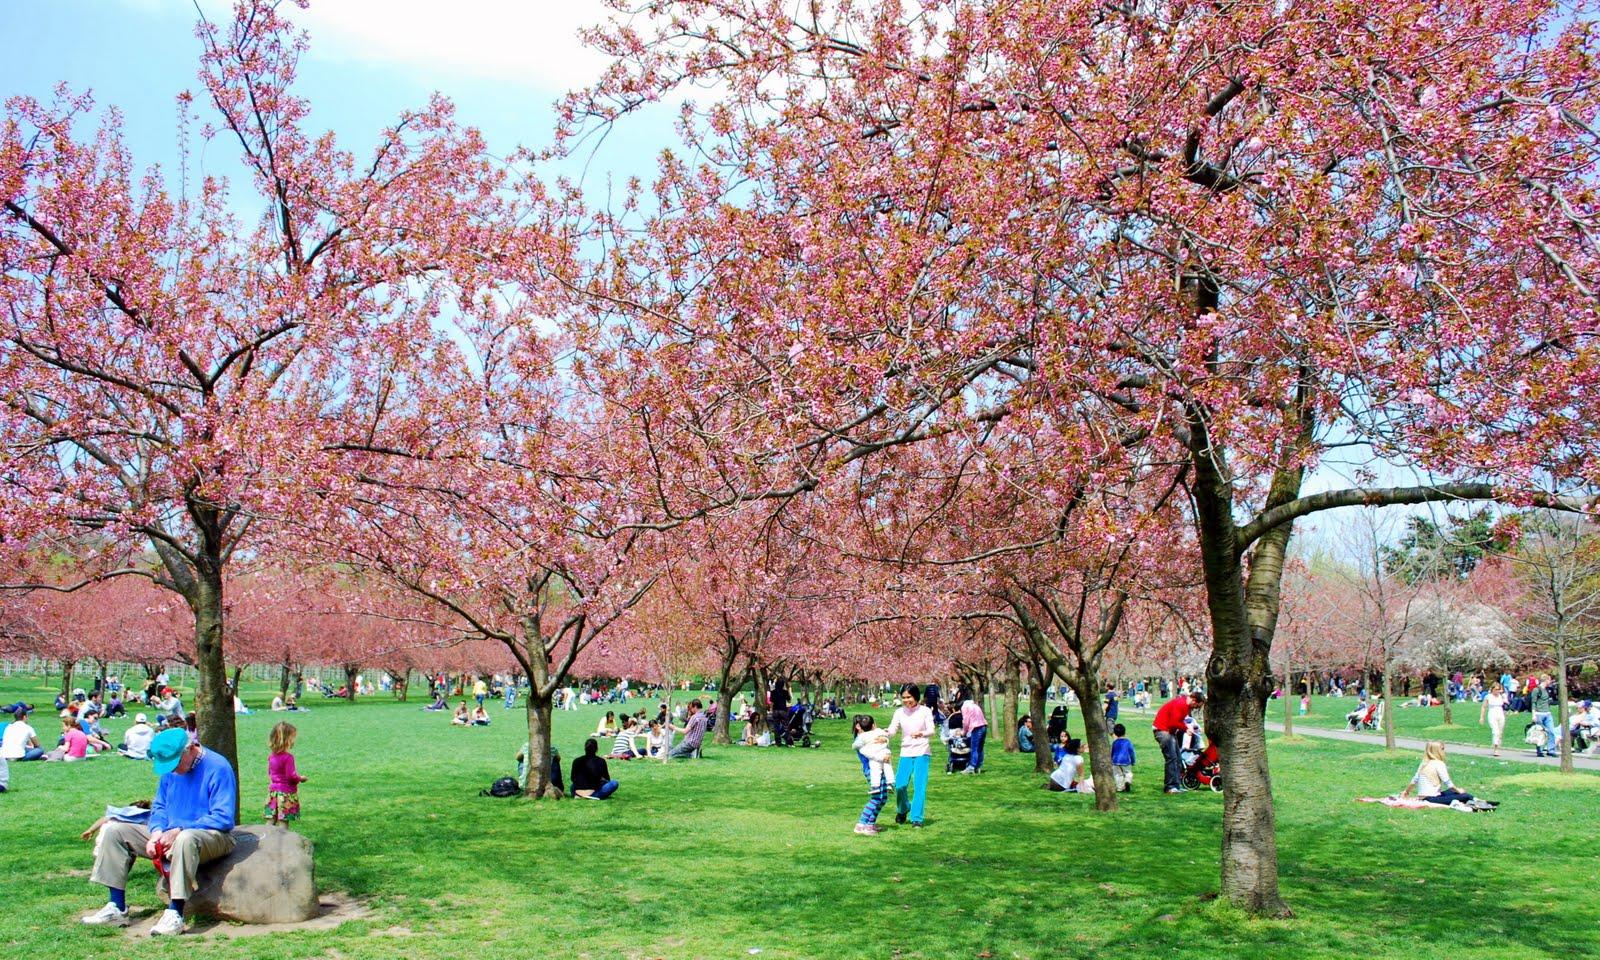 Mille Fiori Favoriti Cherry Blossom Time At The Brooklyn Botanic Garden